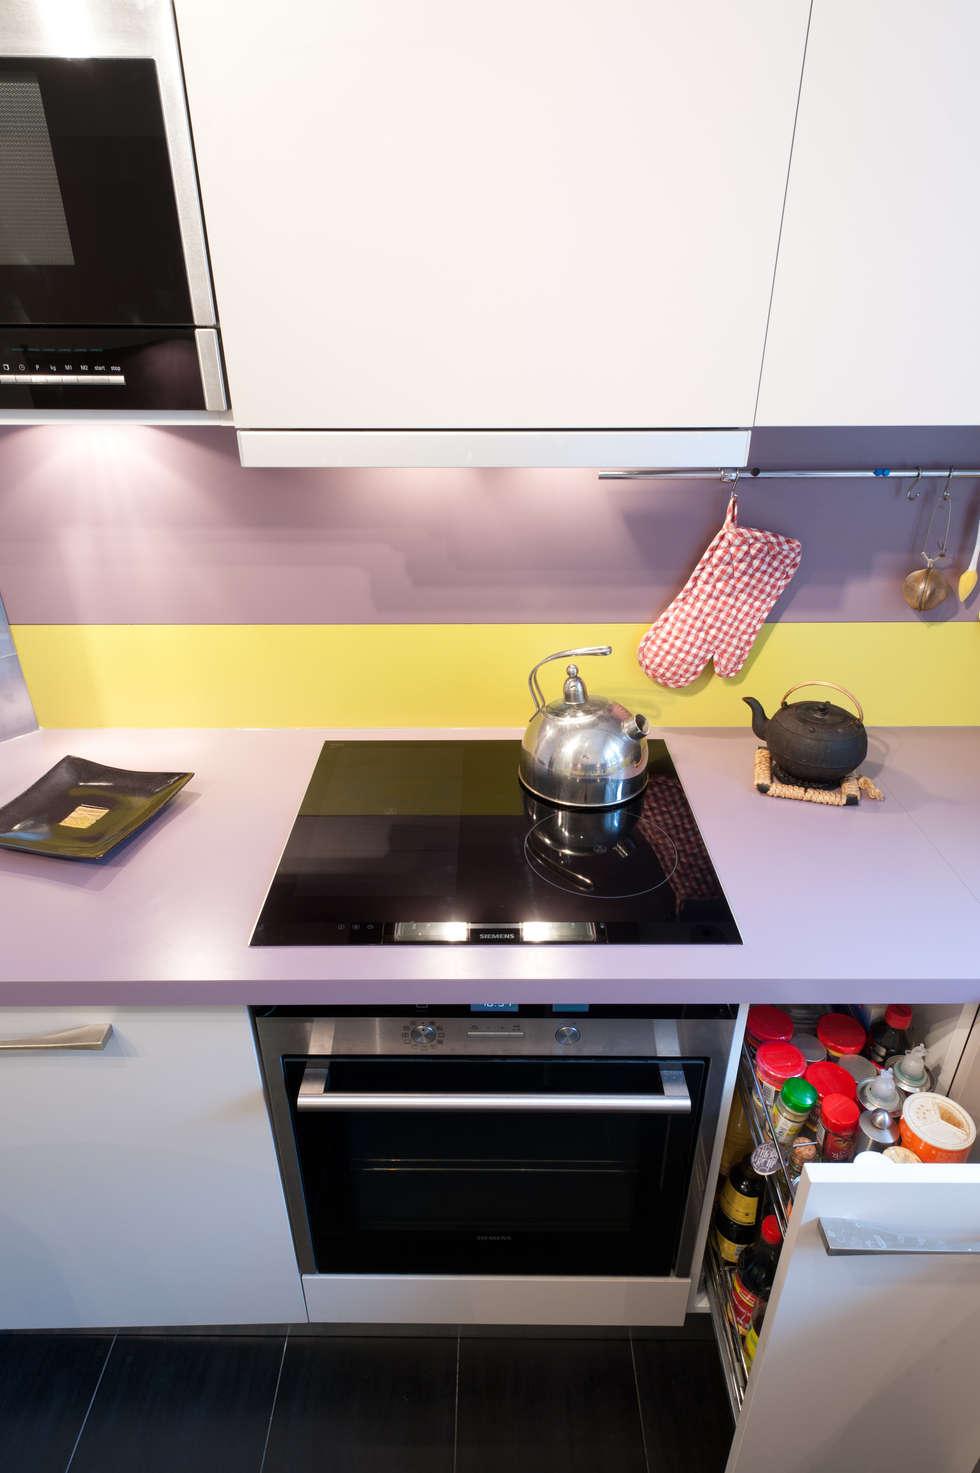 Wohnideen Interior Design Einrichtungsideen Bilder Homify - La cuisine dans le bain